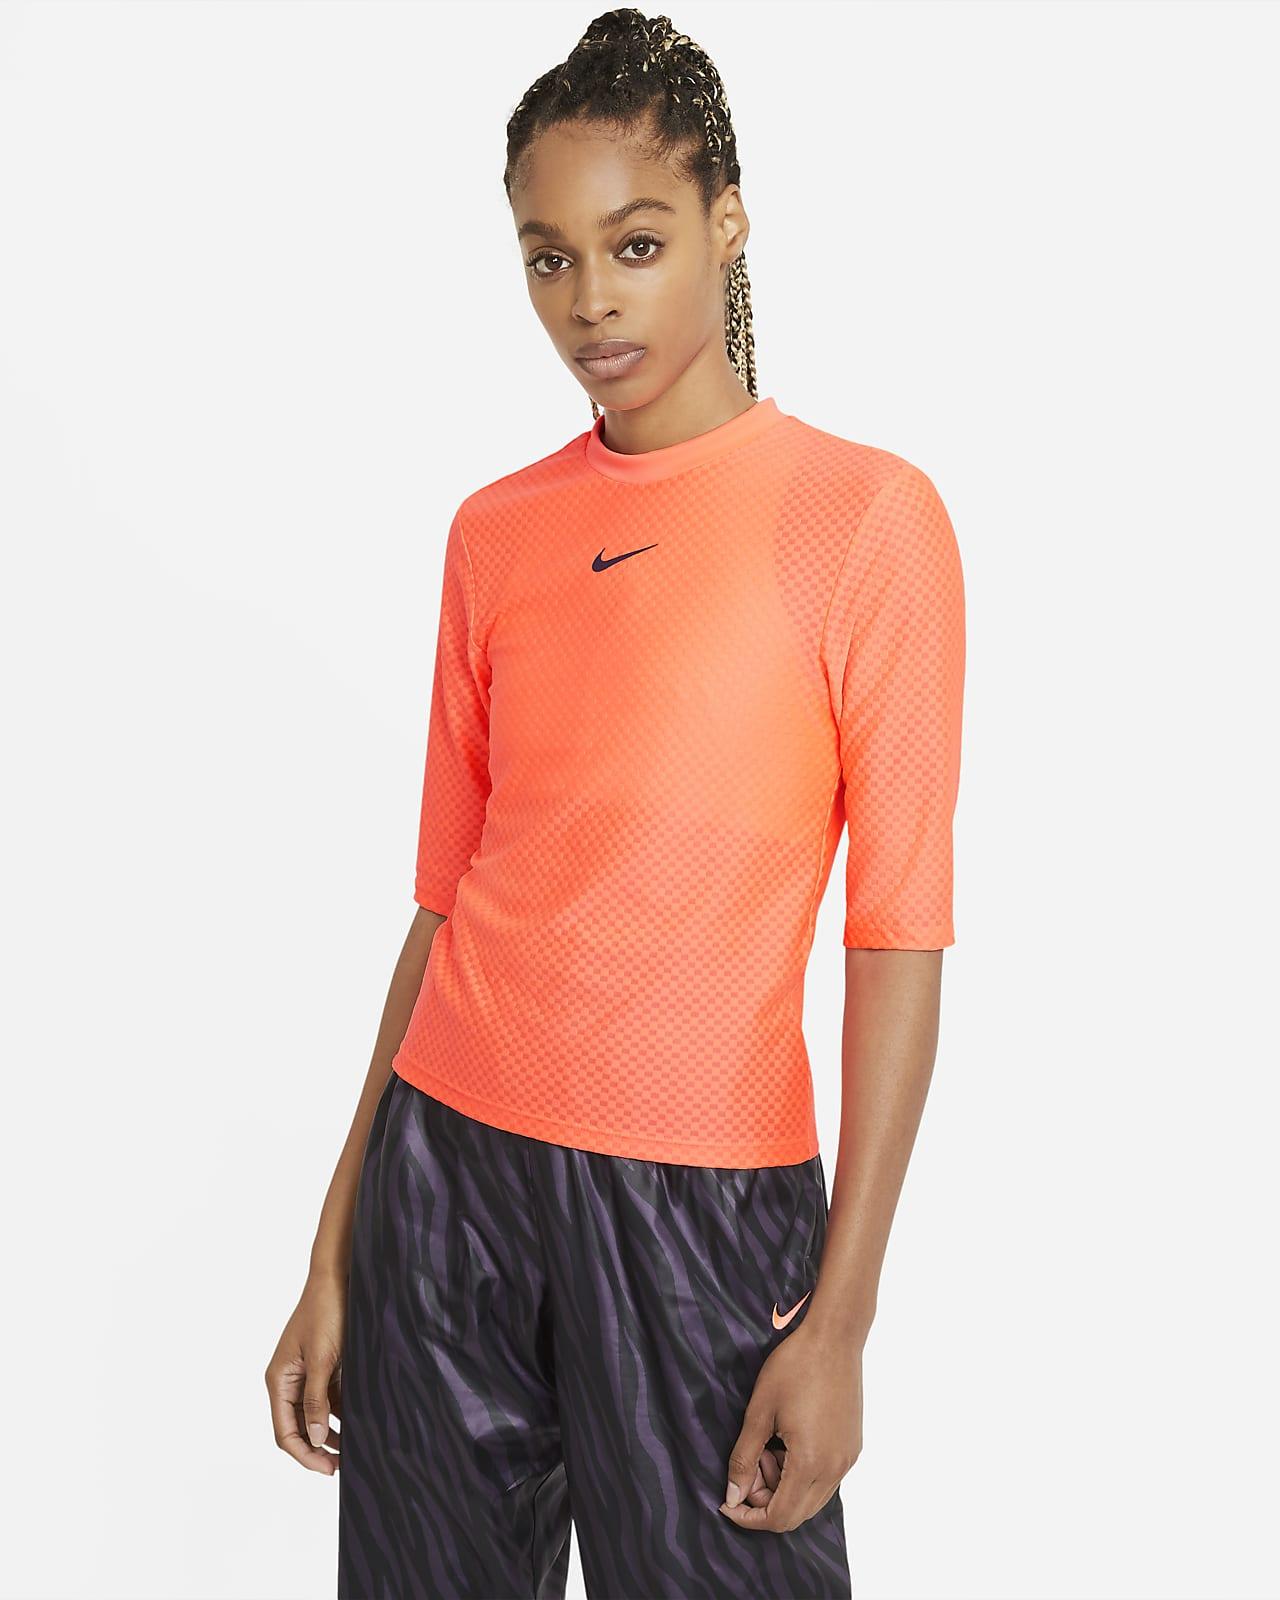 Nike Sportswear Icon Clash Women's Top